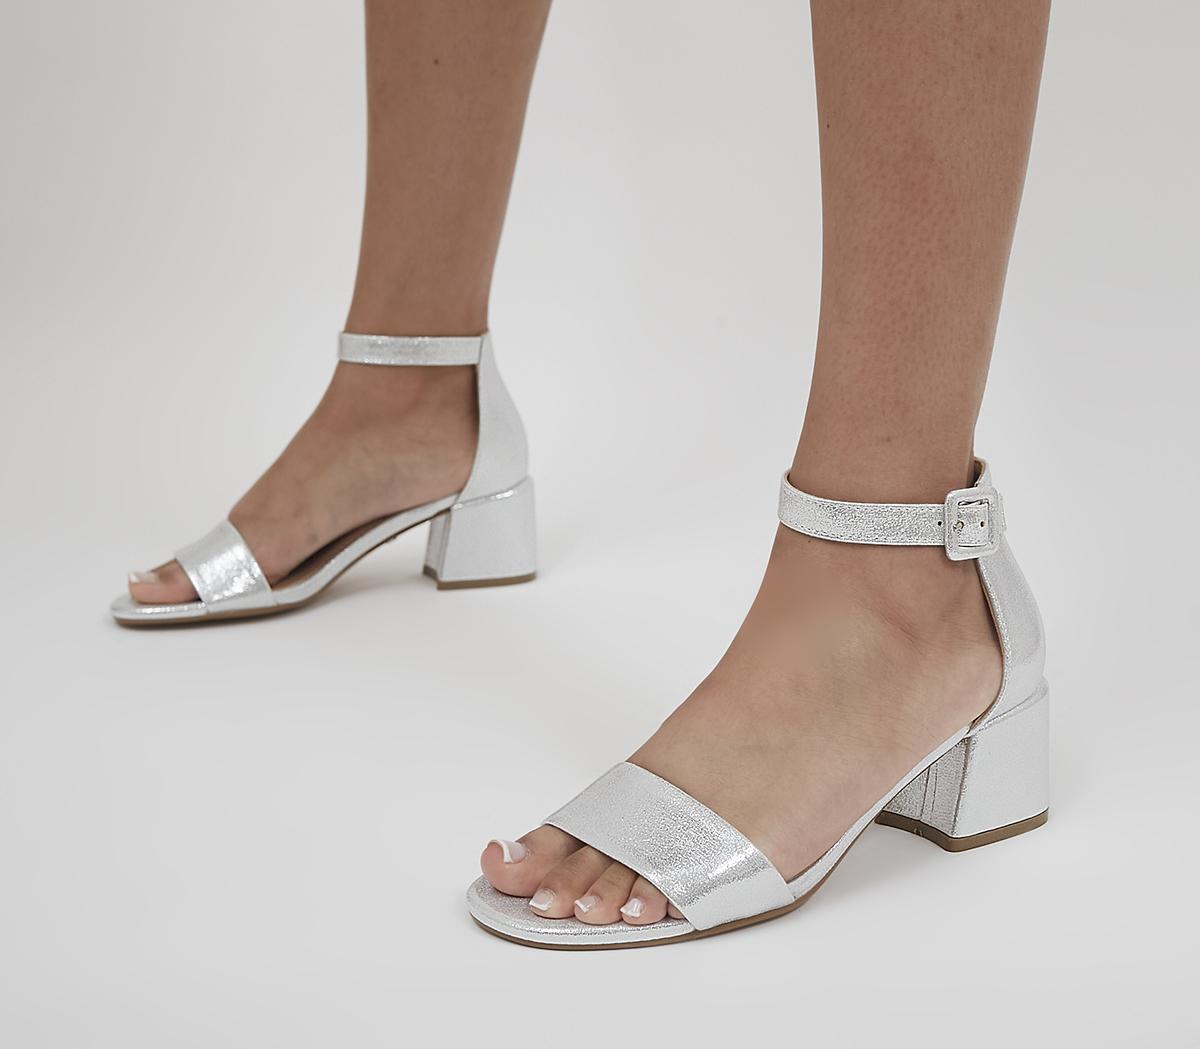 Minimum Effort Two Part Low Block Heels